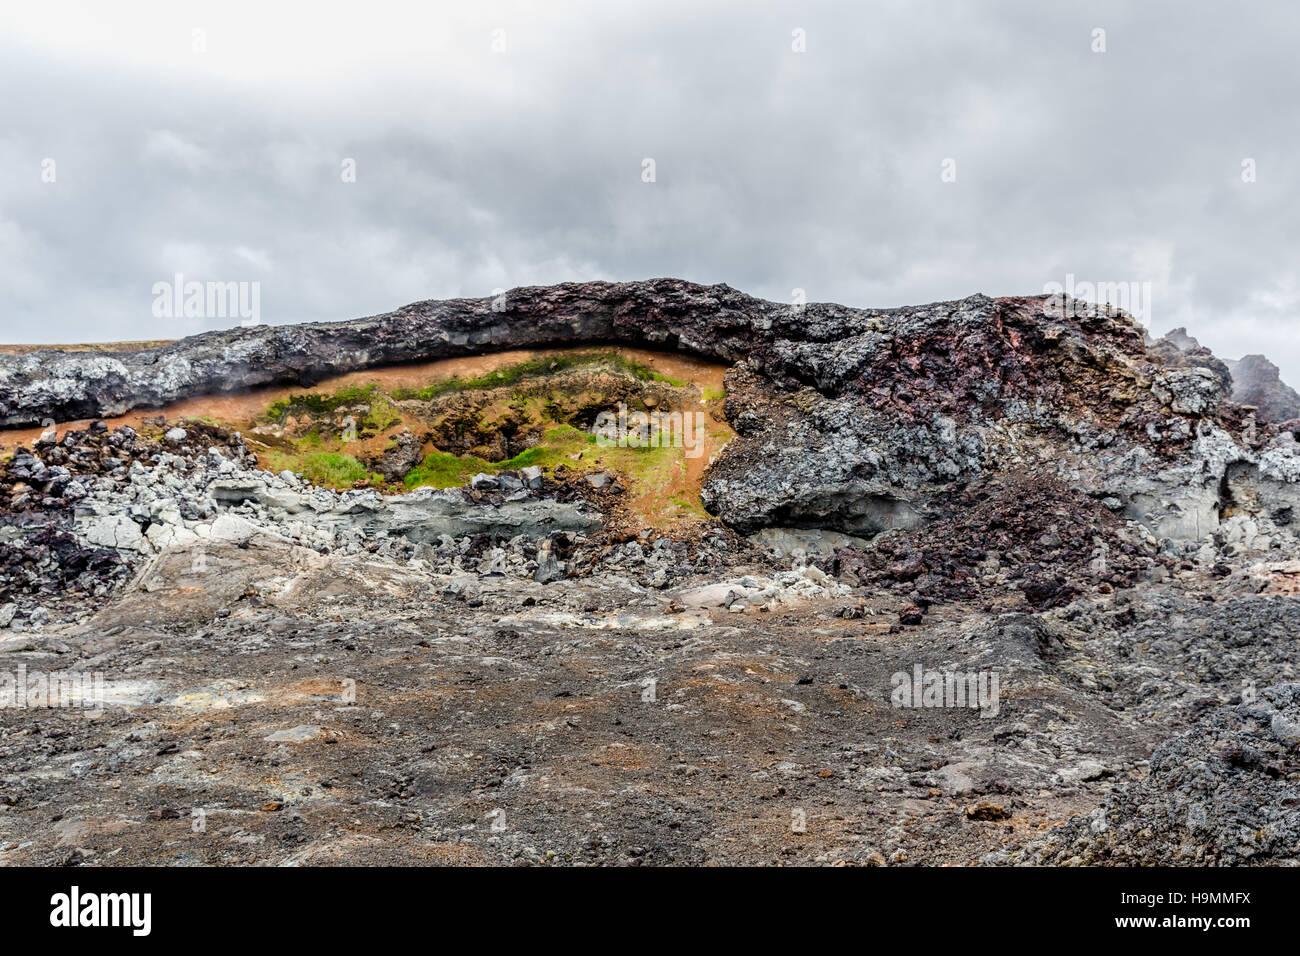 lava fields, Krafla volcano, Iceland, volcanic area, Northeast Iceland, craters, - Stock Image